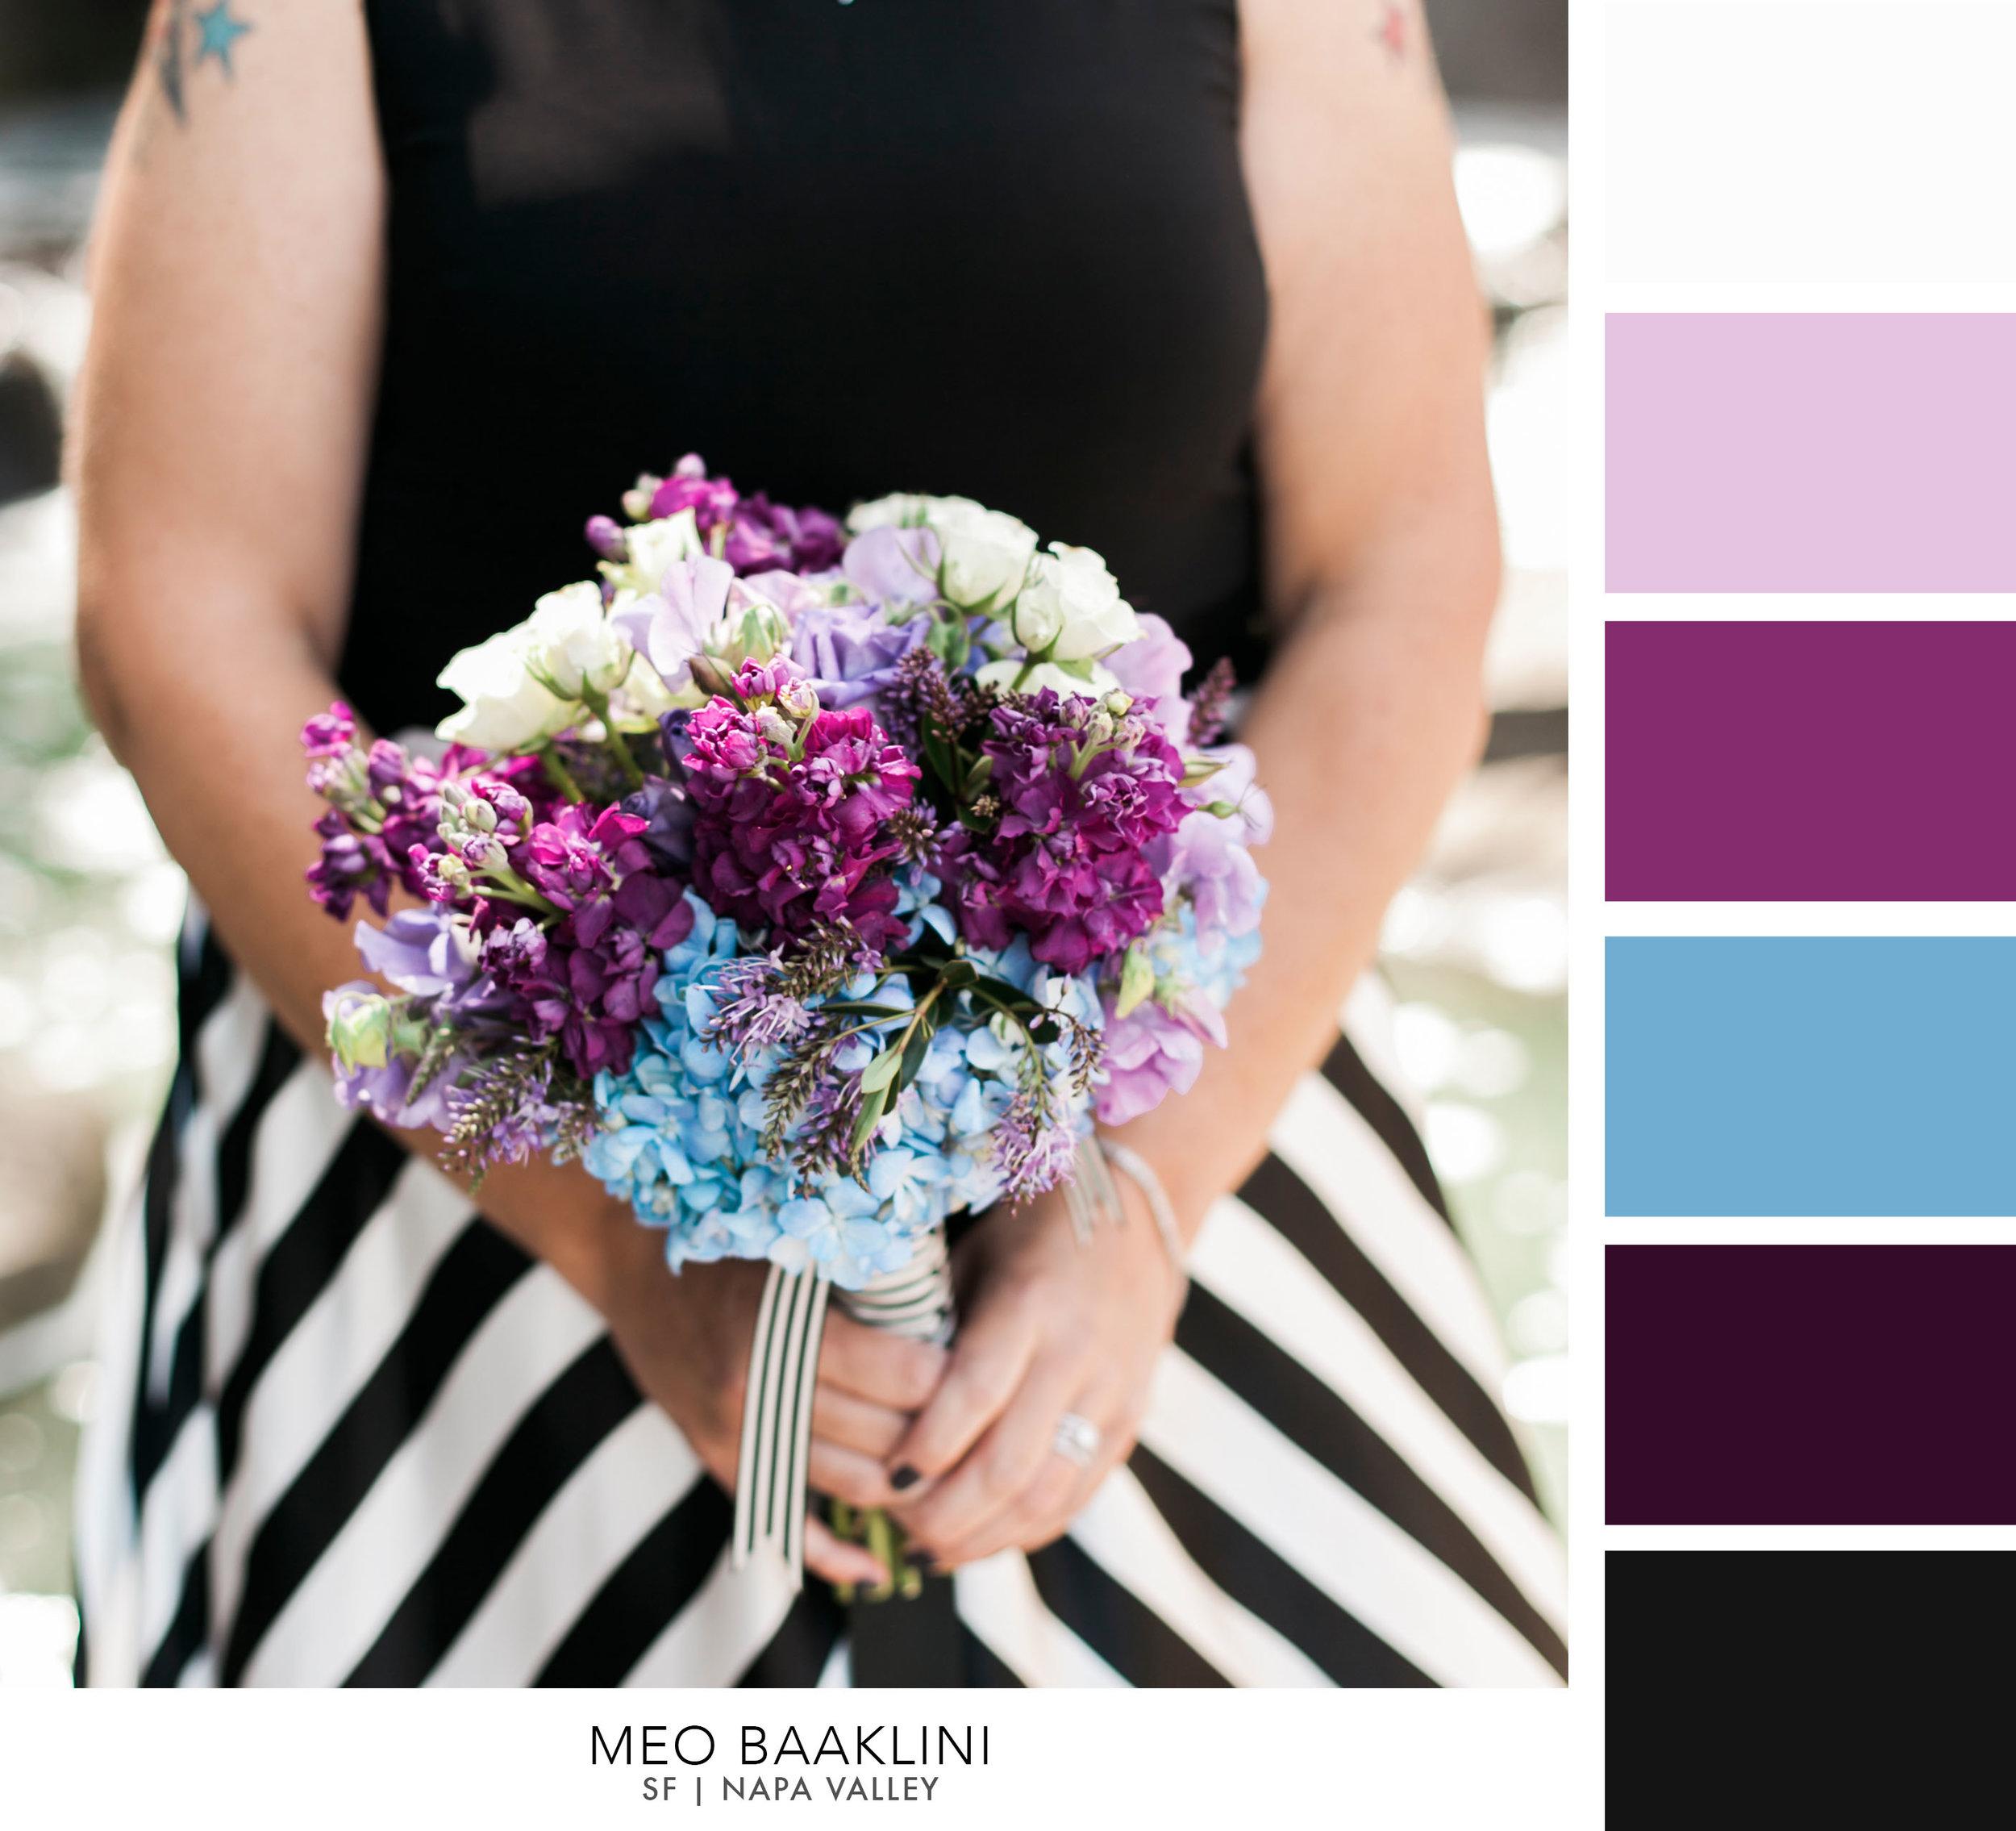 AWedding_Bouquet_Color_Palette_Inspiration_201634.jpg